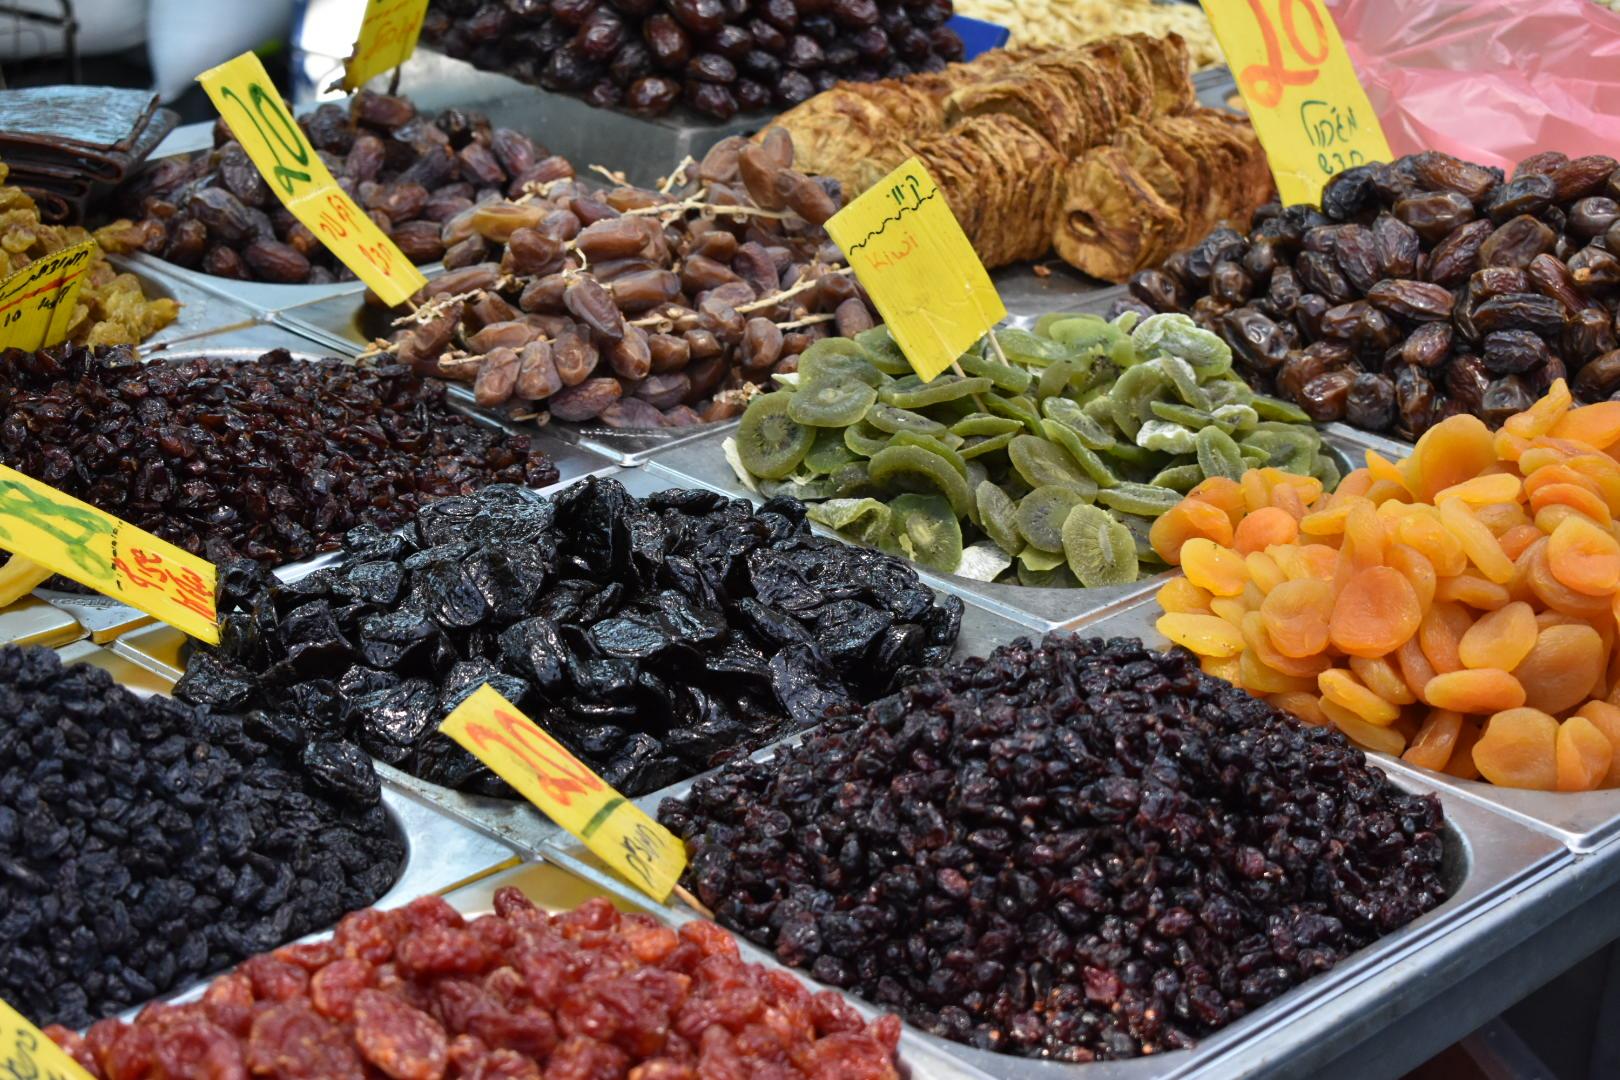 The markets of Israel - Mahine Yehuda